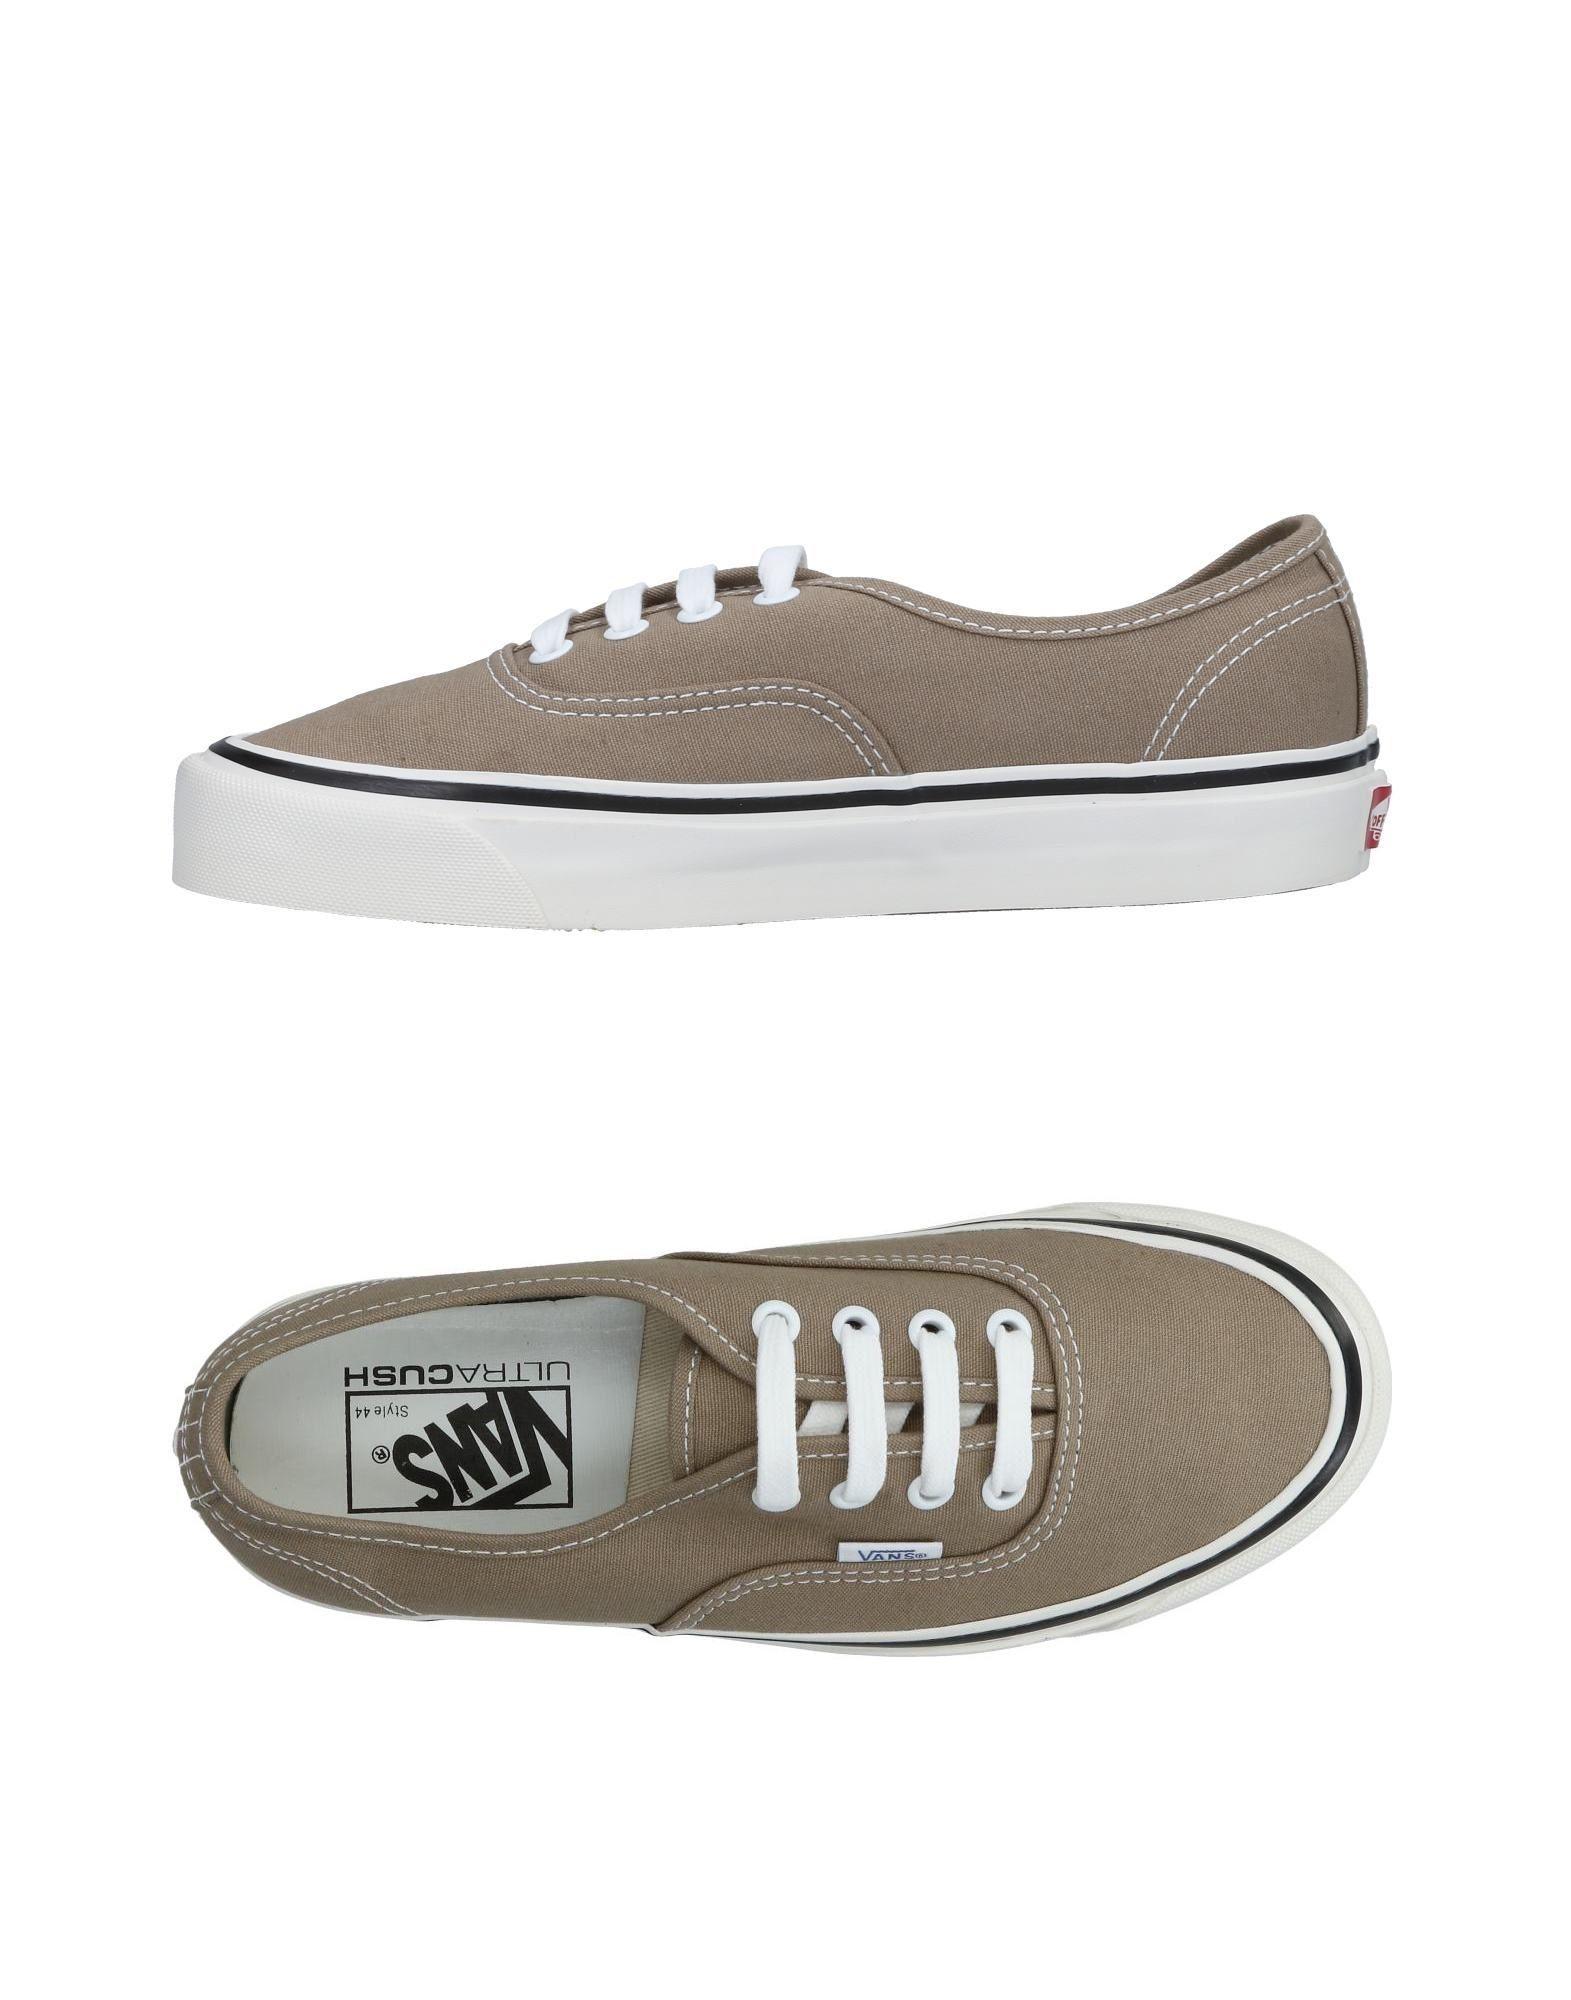 A buon mercato Sneakers Vans Donna - 11495574JN